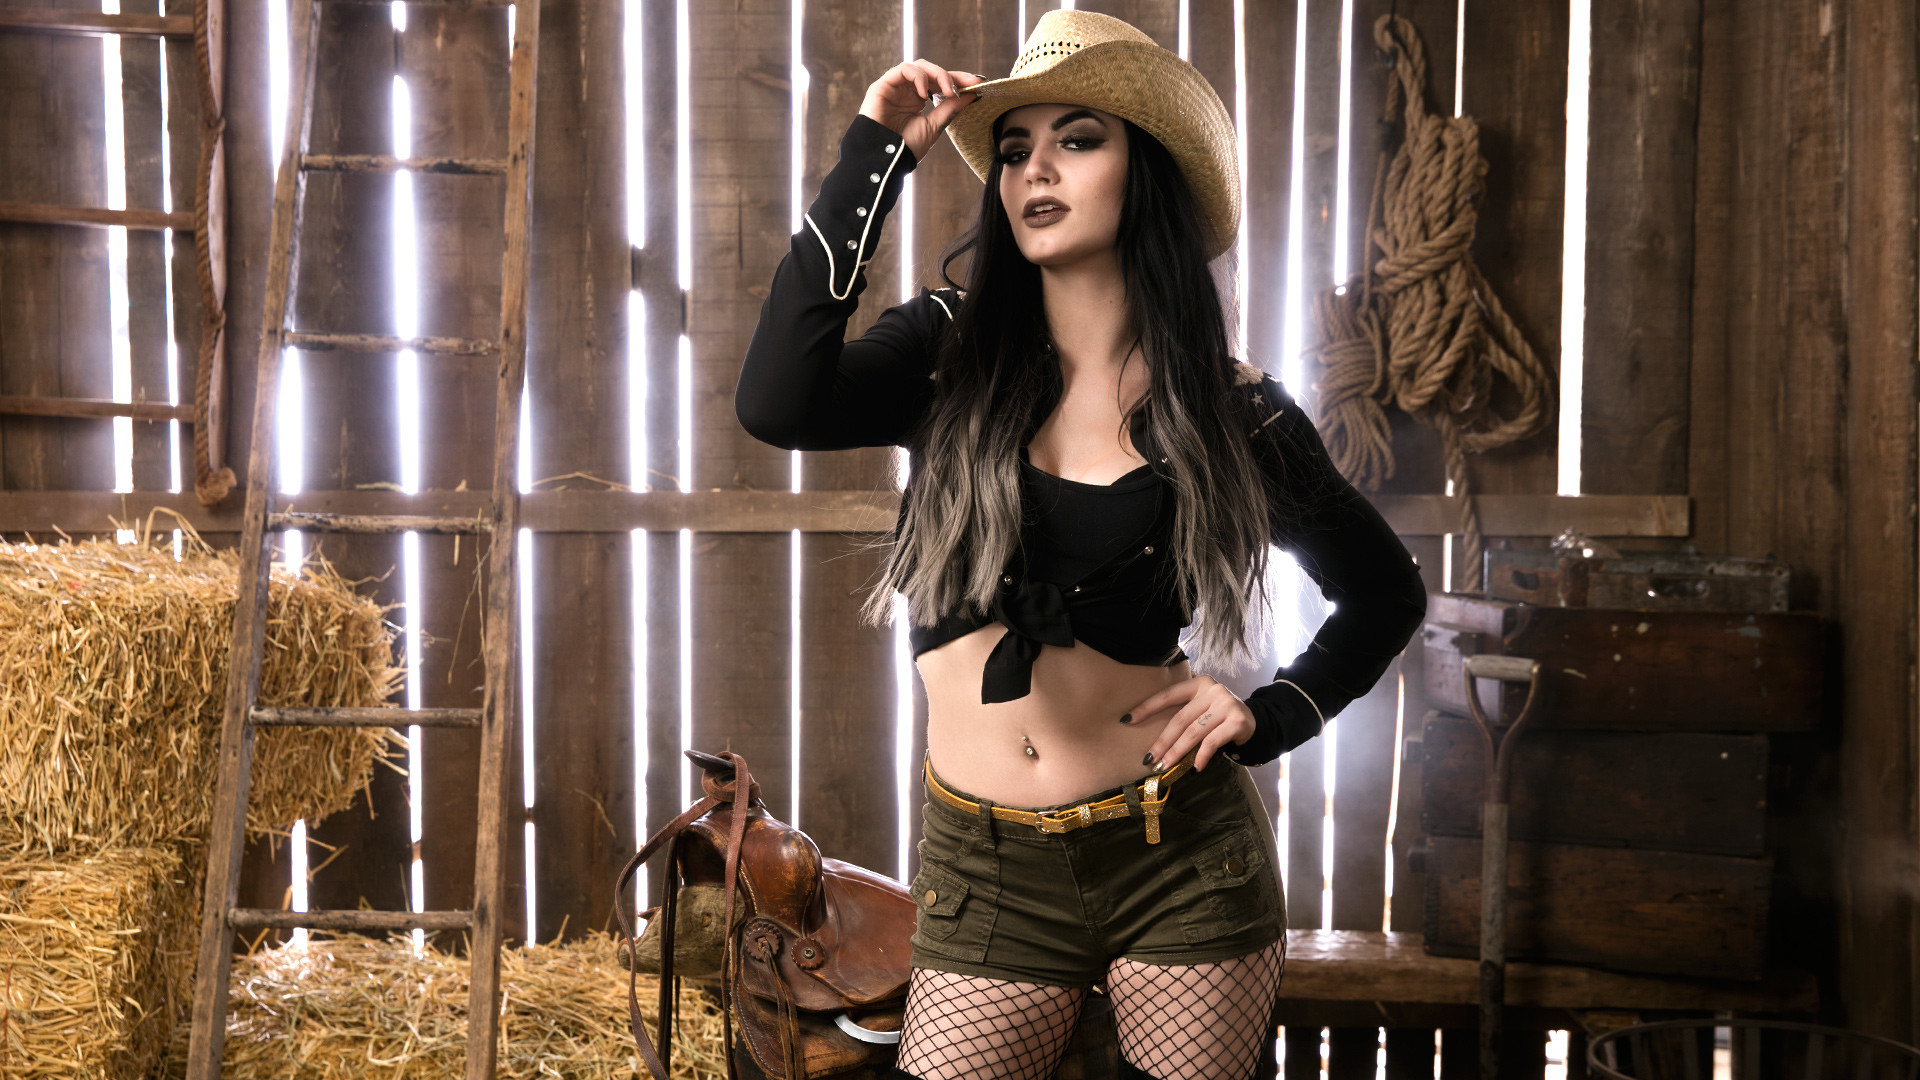 Explore Paige Wwe, Paige O'hara, and more!